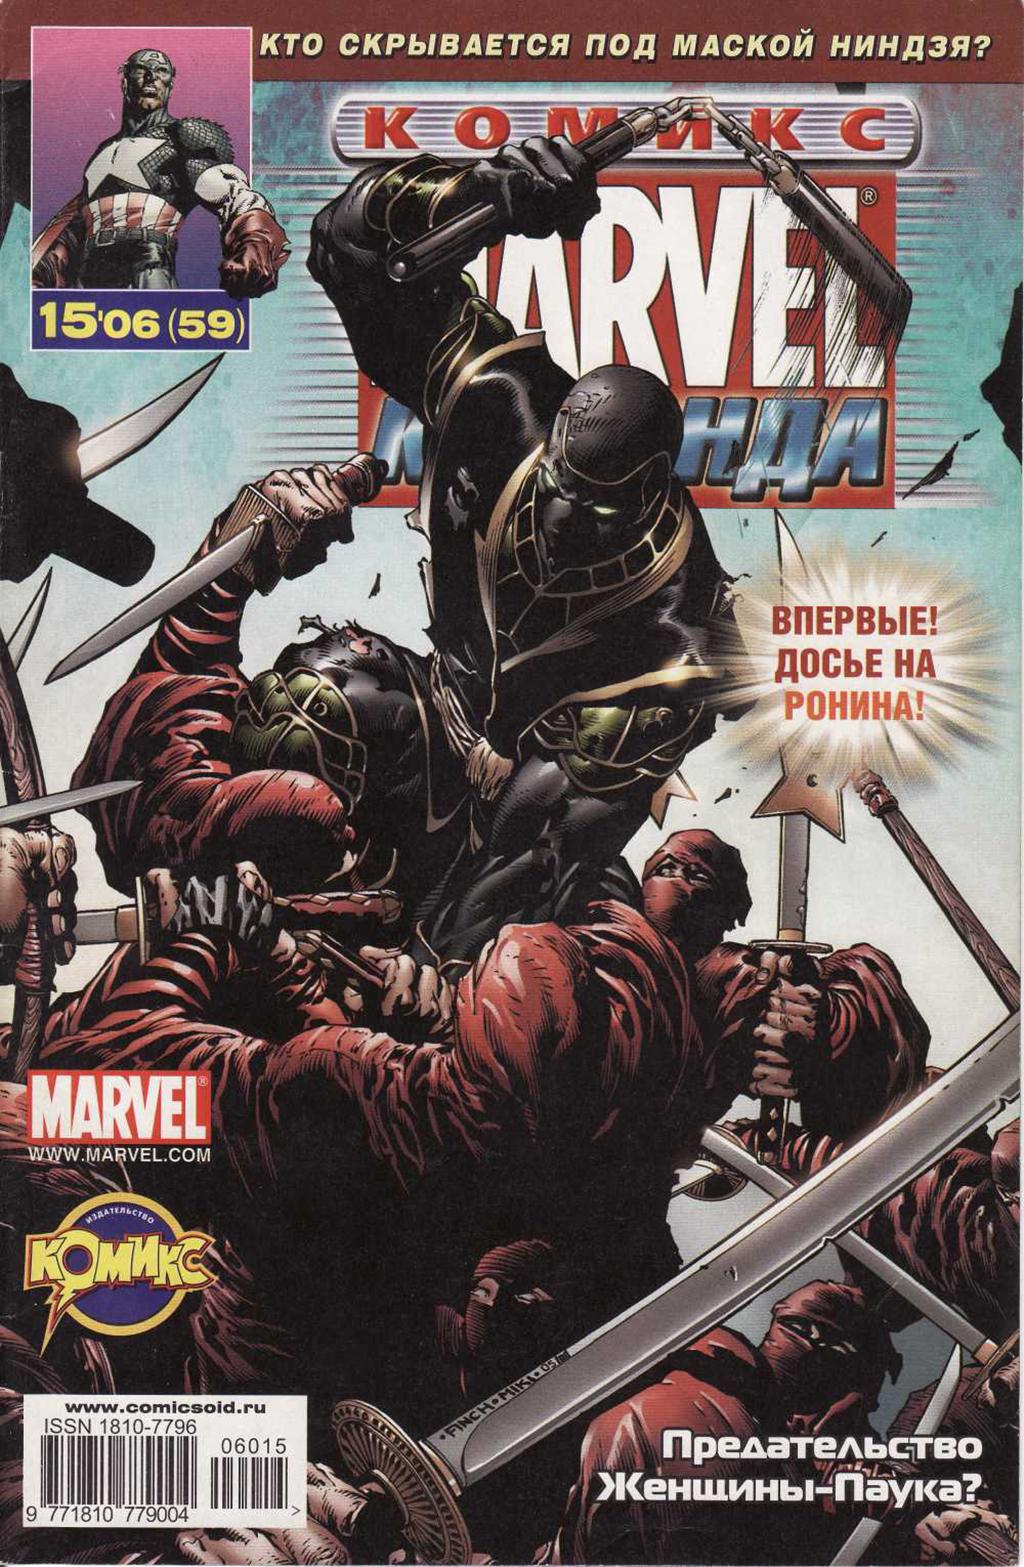 Комикс Современная Марвел - команда